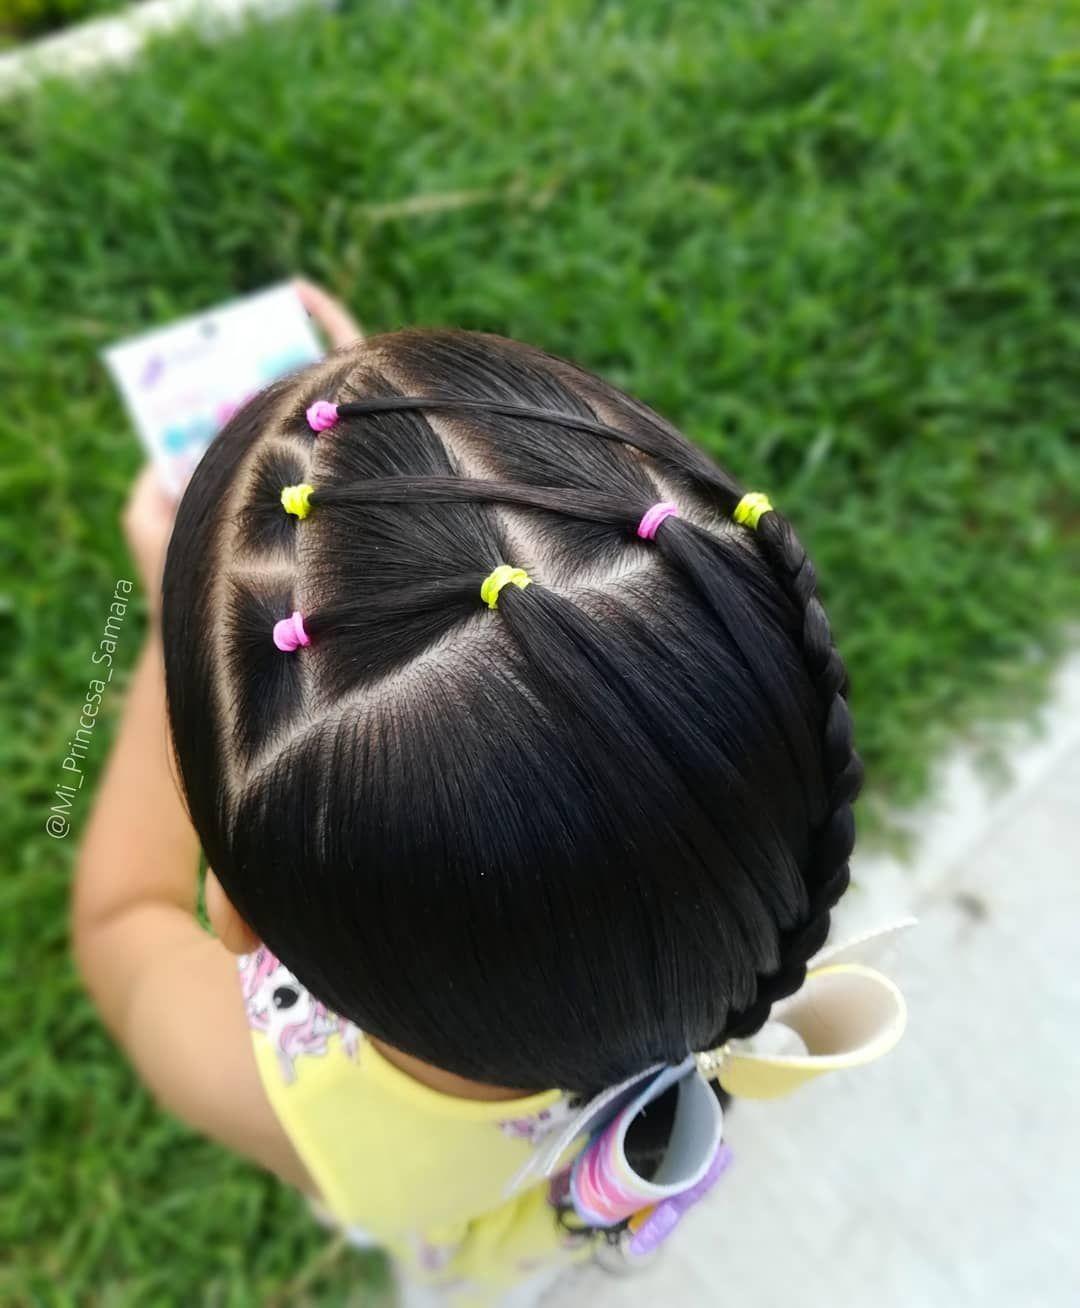 "Hairstyles For Princesses 👸🏻💜 on Instagram: ""Buen Día !!! 💛 Estilo con liguitas 💞 . . . Moño : @samybows . . #miprincesasamara🌹 . .  #braid #braids #braider #braidoftheday #braidideas…"" -   - #asamybows #backdropideas #bakingrecipes #bohoweddingdress #braid #braider #braidideas #braidoftheday #braids #Buen #con #cookingrecipes #día #diyjewelryart #diyjewelryinspiration #diyjewelryrings #diyjewelrytosell #estilo #farmhouselivingroom #fashionjewelrydiy #gardenlandscaping #goldenjewelry #hair"